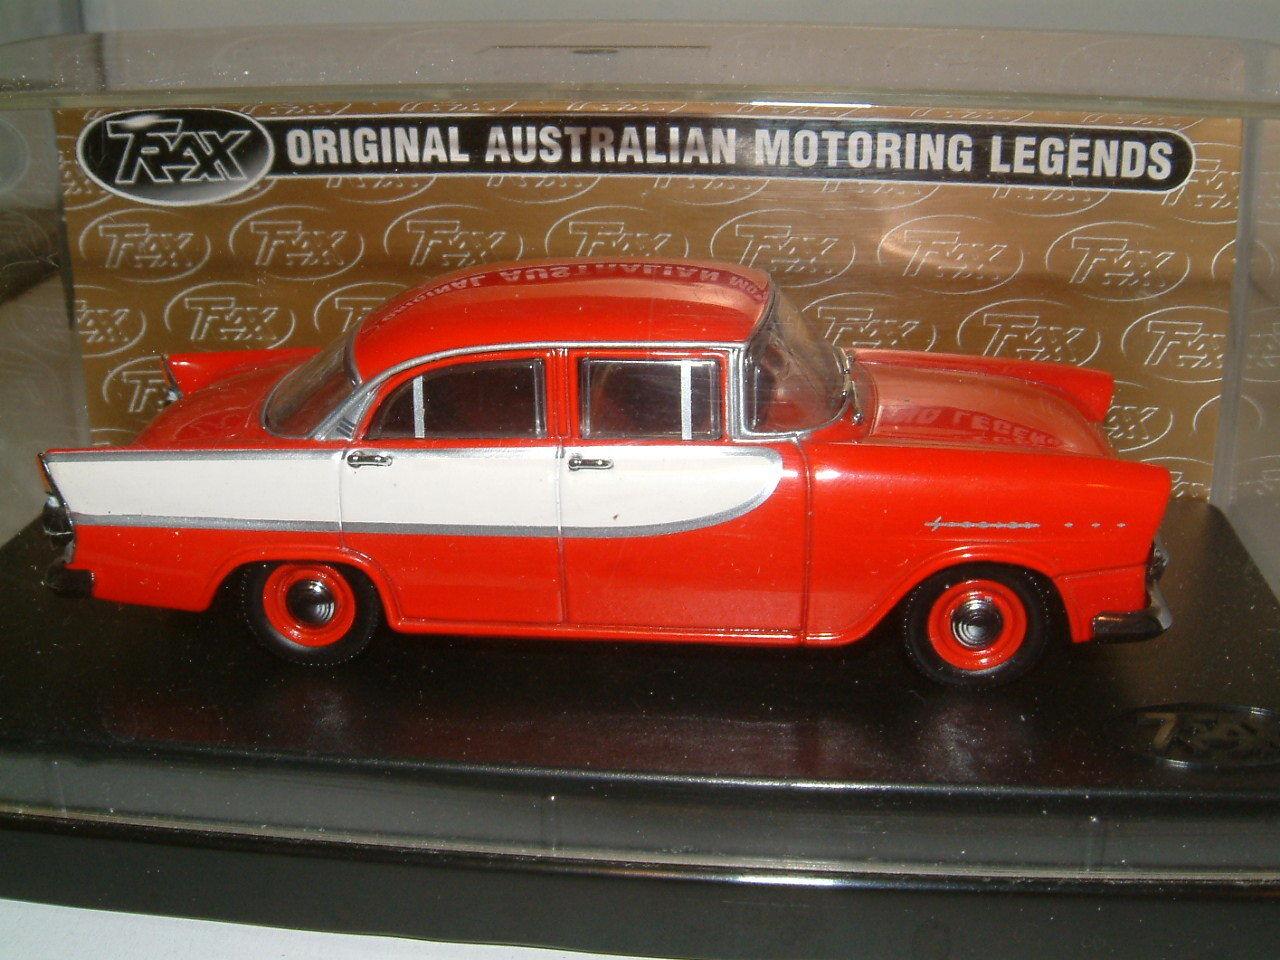 1 43 TRAX 1960 HOLDEN FB SPECIAL SEDAN IN rot Weiß, AUSTRALIA TG